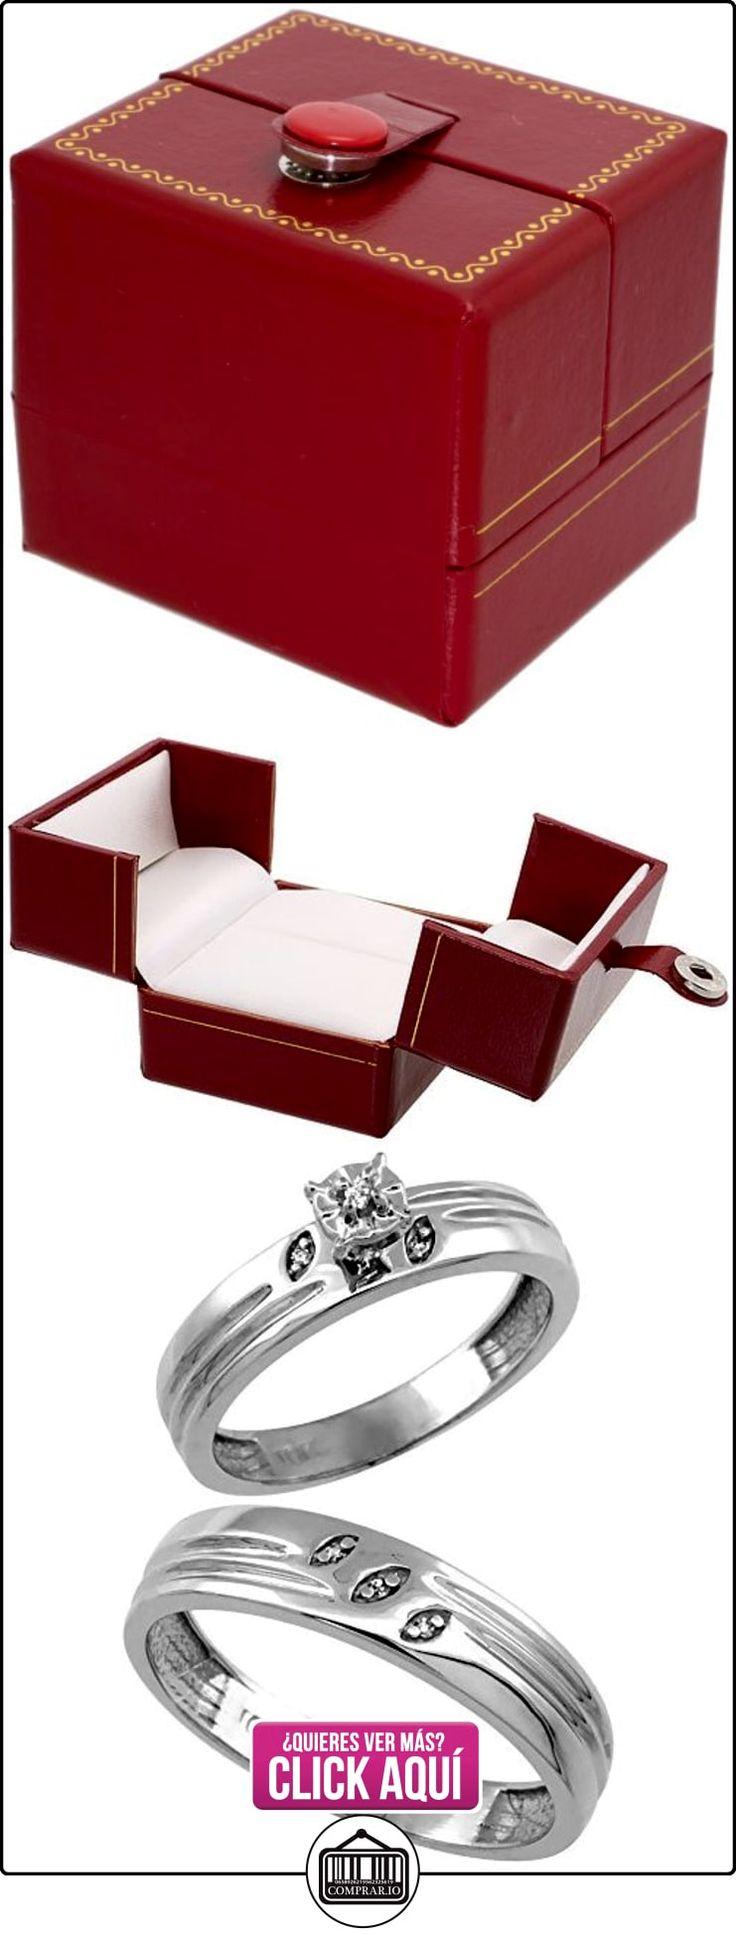 Revoni - Anillo de compromiso de oro blanco  ✿ Joyas para hombres especiales - lujo ✿ ▬► Ver oferta: http://comprar.io/goto/B005EGP2S0